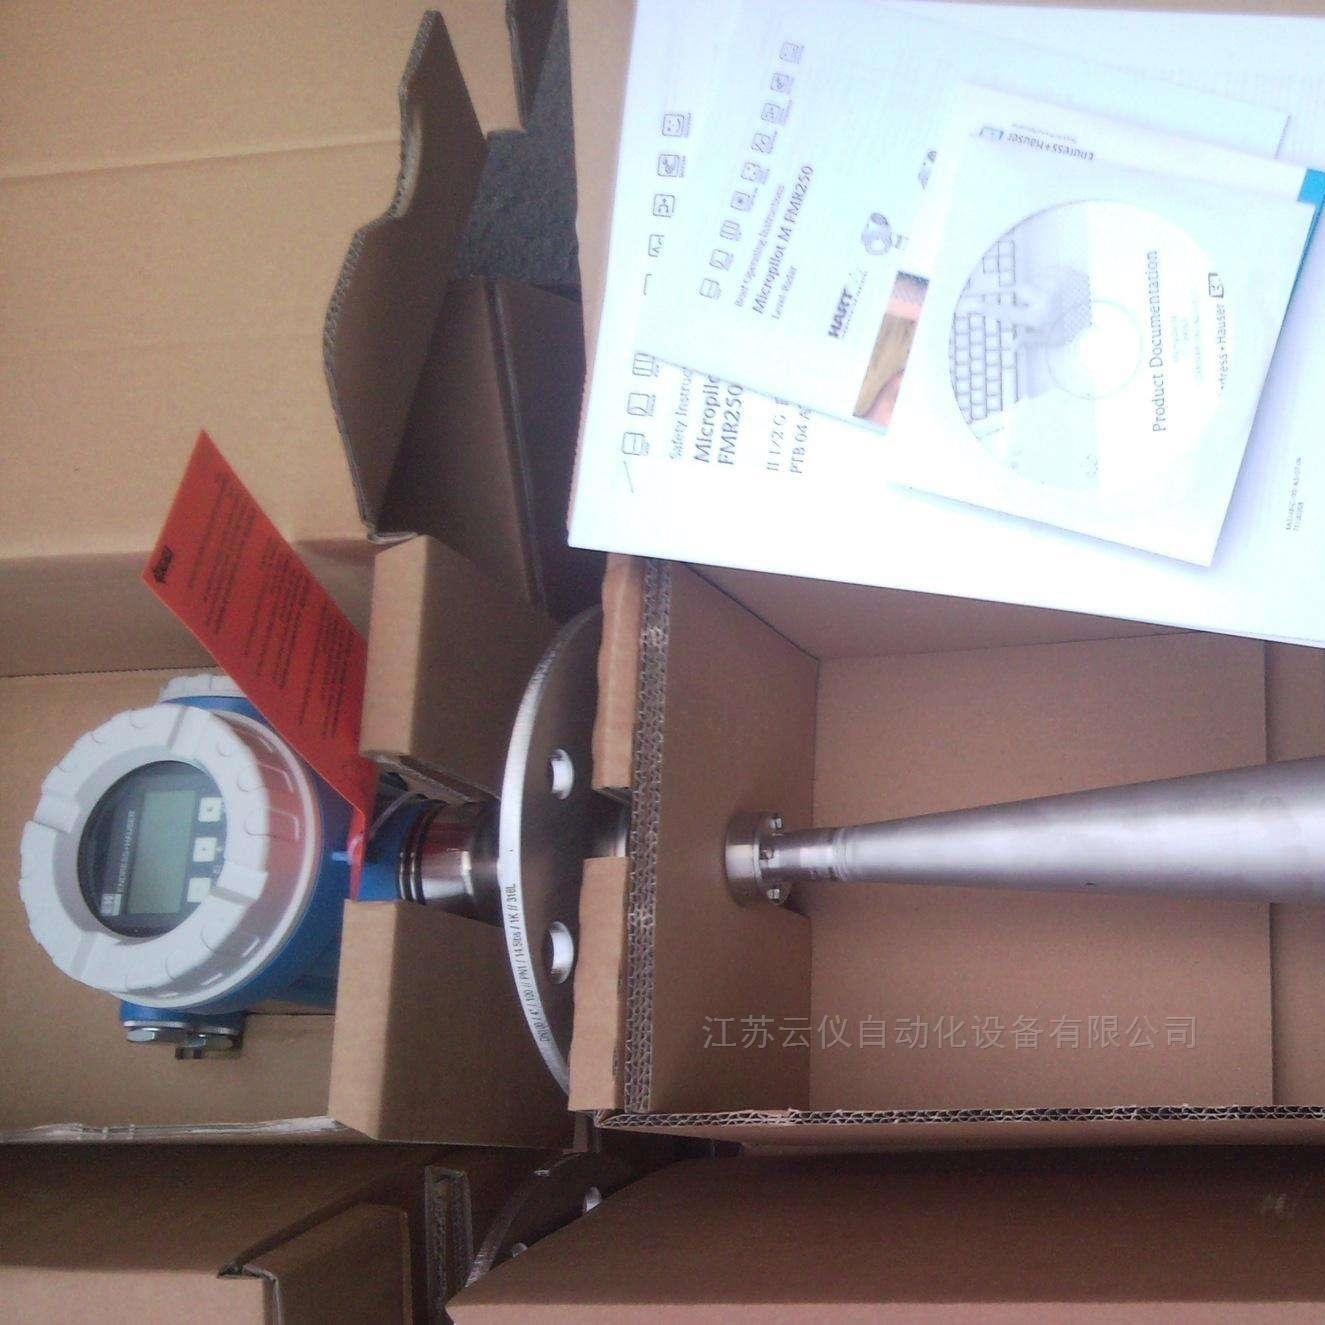 e+h雷达液位计频率多少